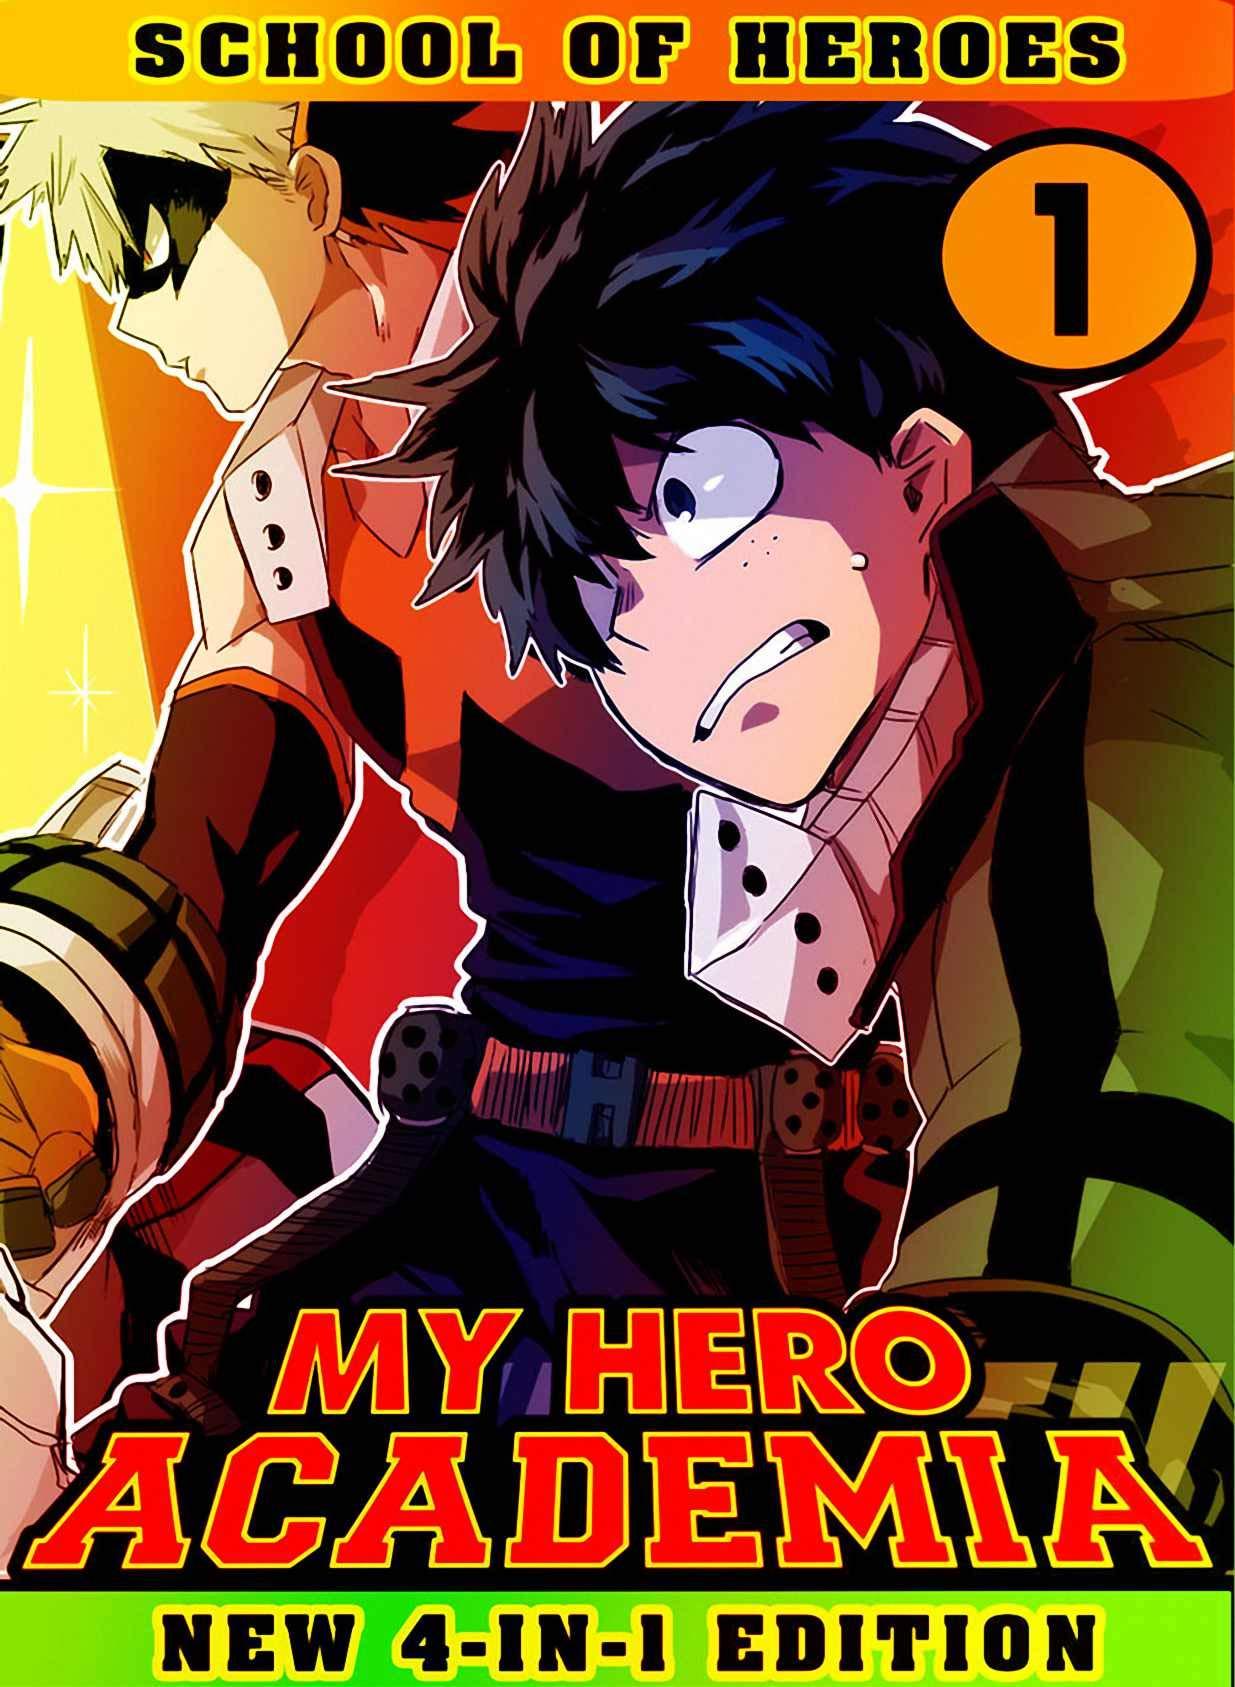 My Hero Academia School: Book 1 Collection - Manga My Hero Academia Action Shonen Adventure Fantasy